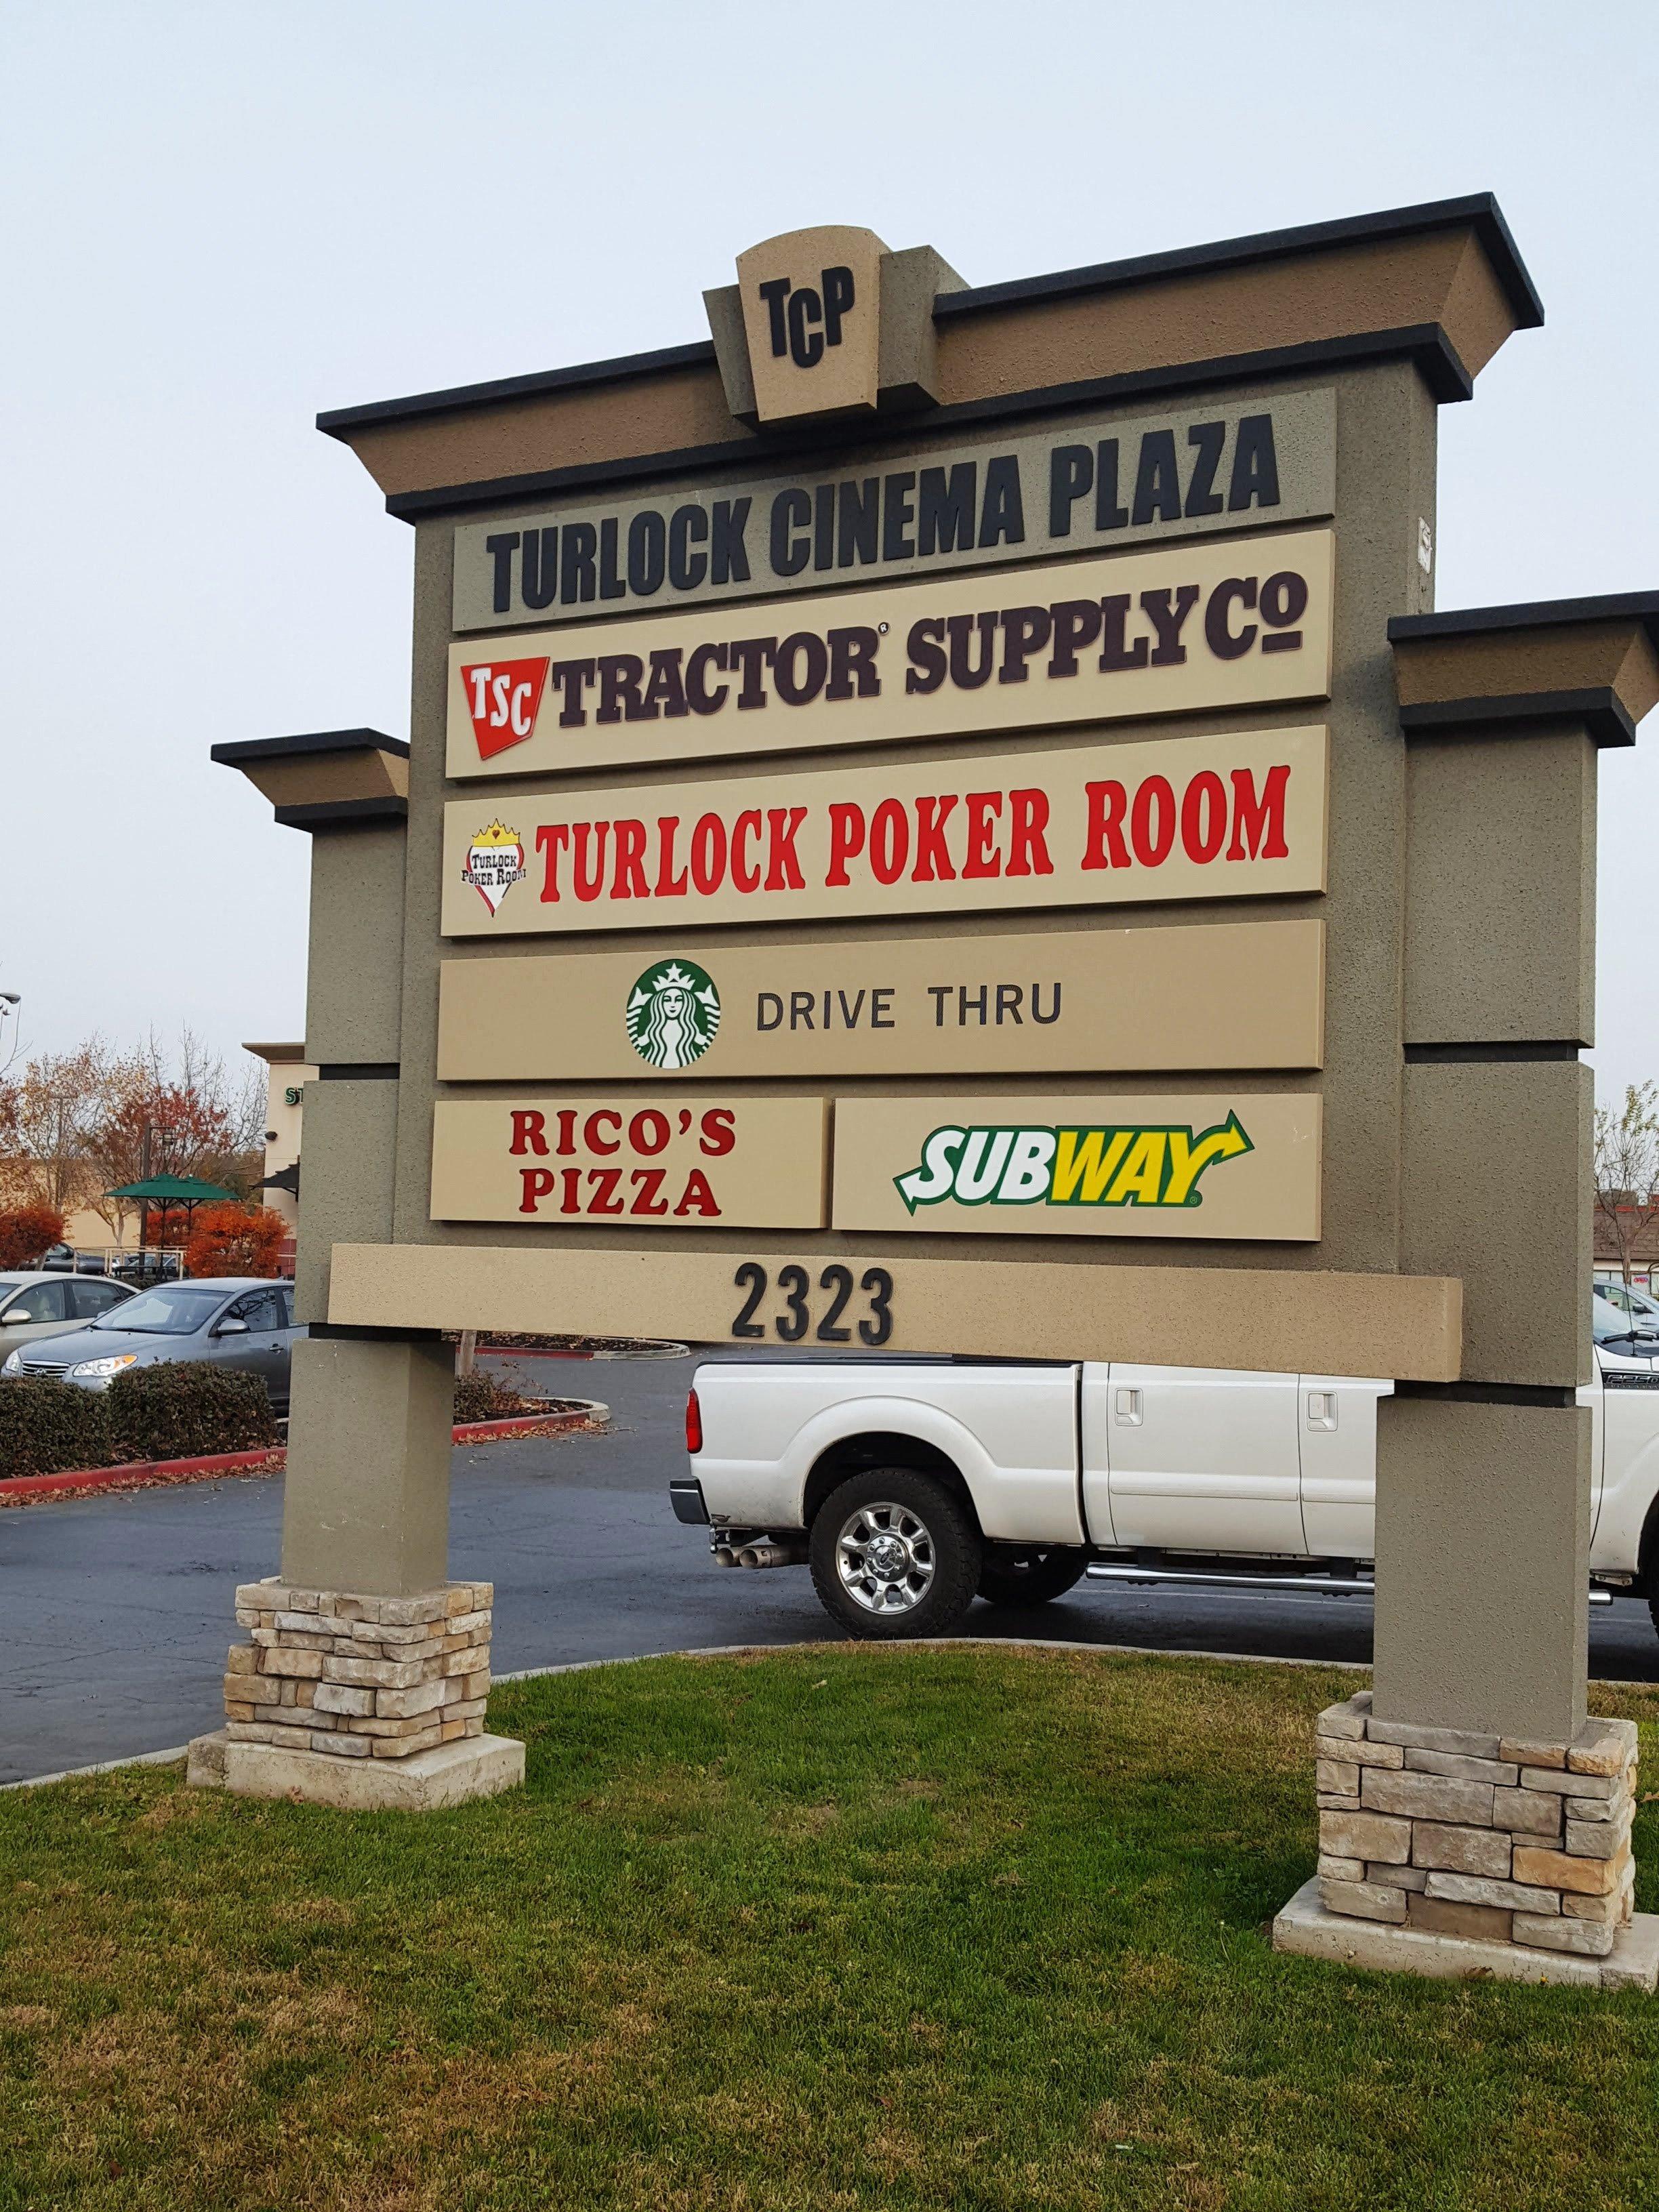 turlock cinema center 2301 west main street turlock ca office space turlock cinema center 2301 west main